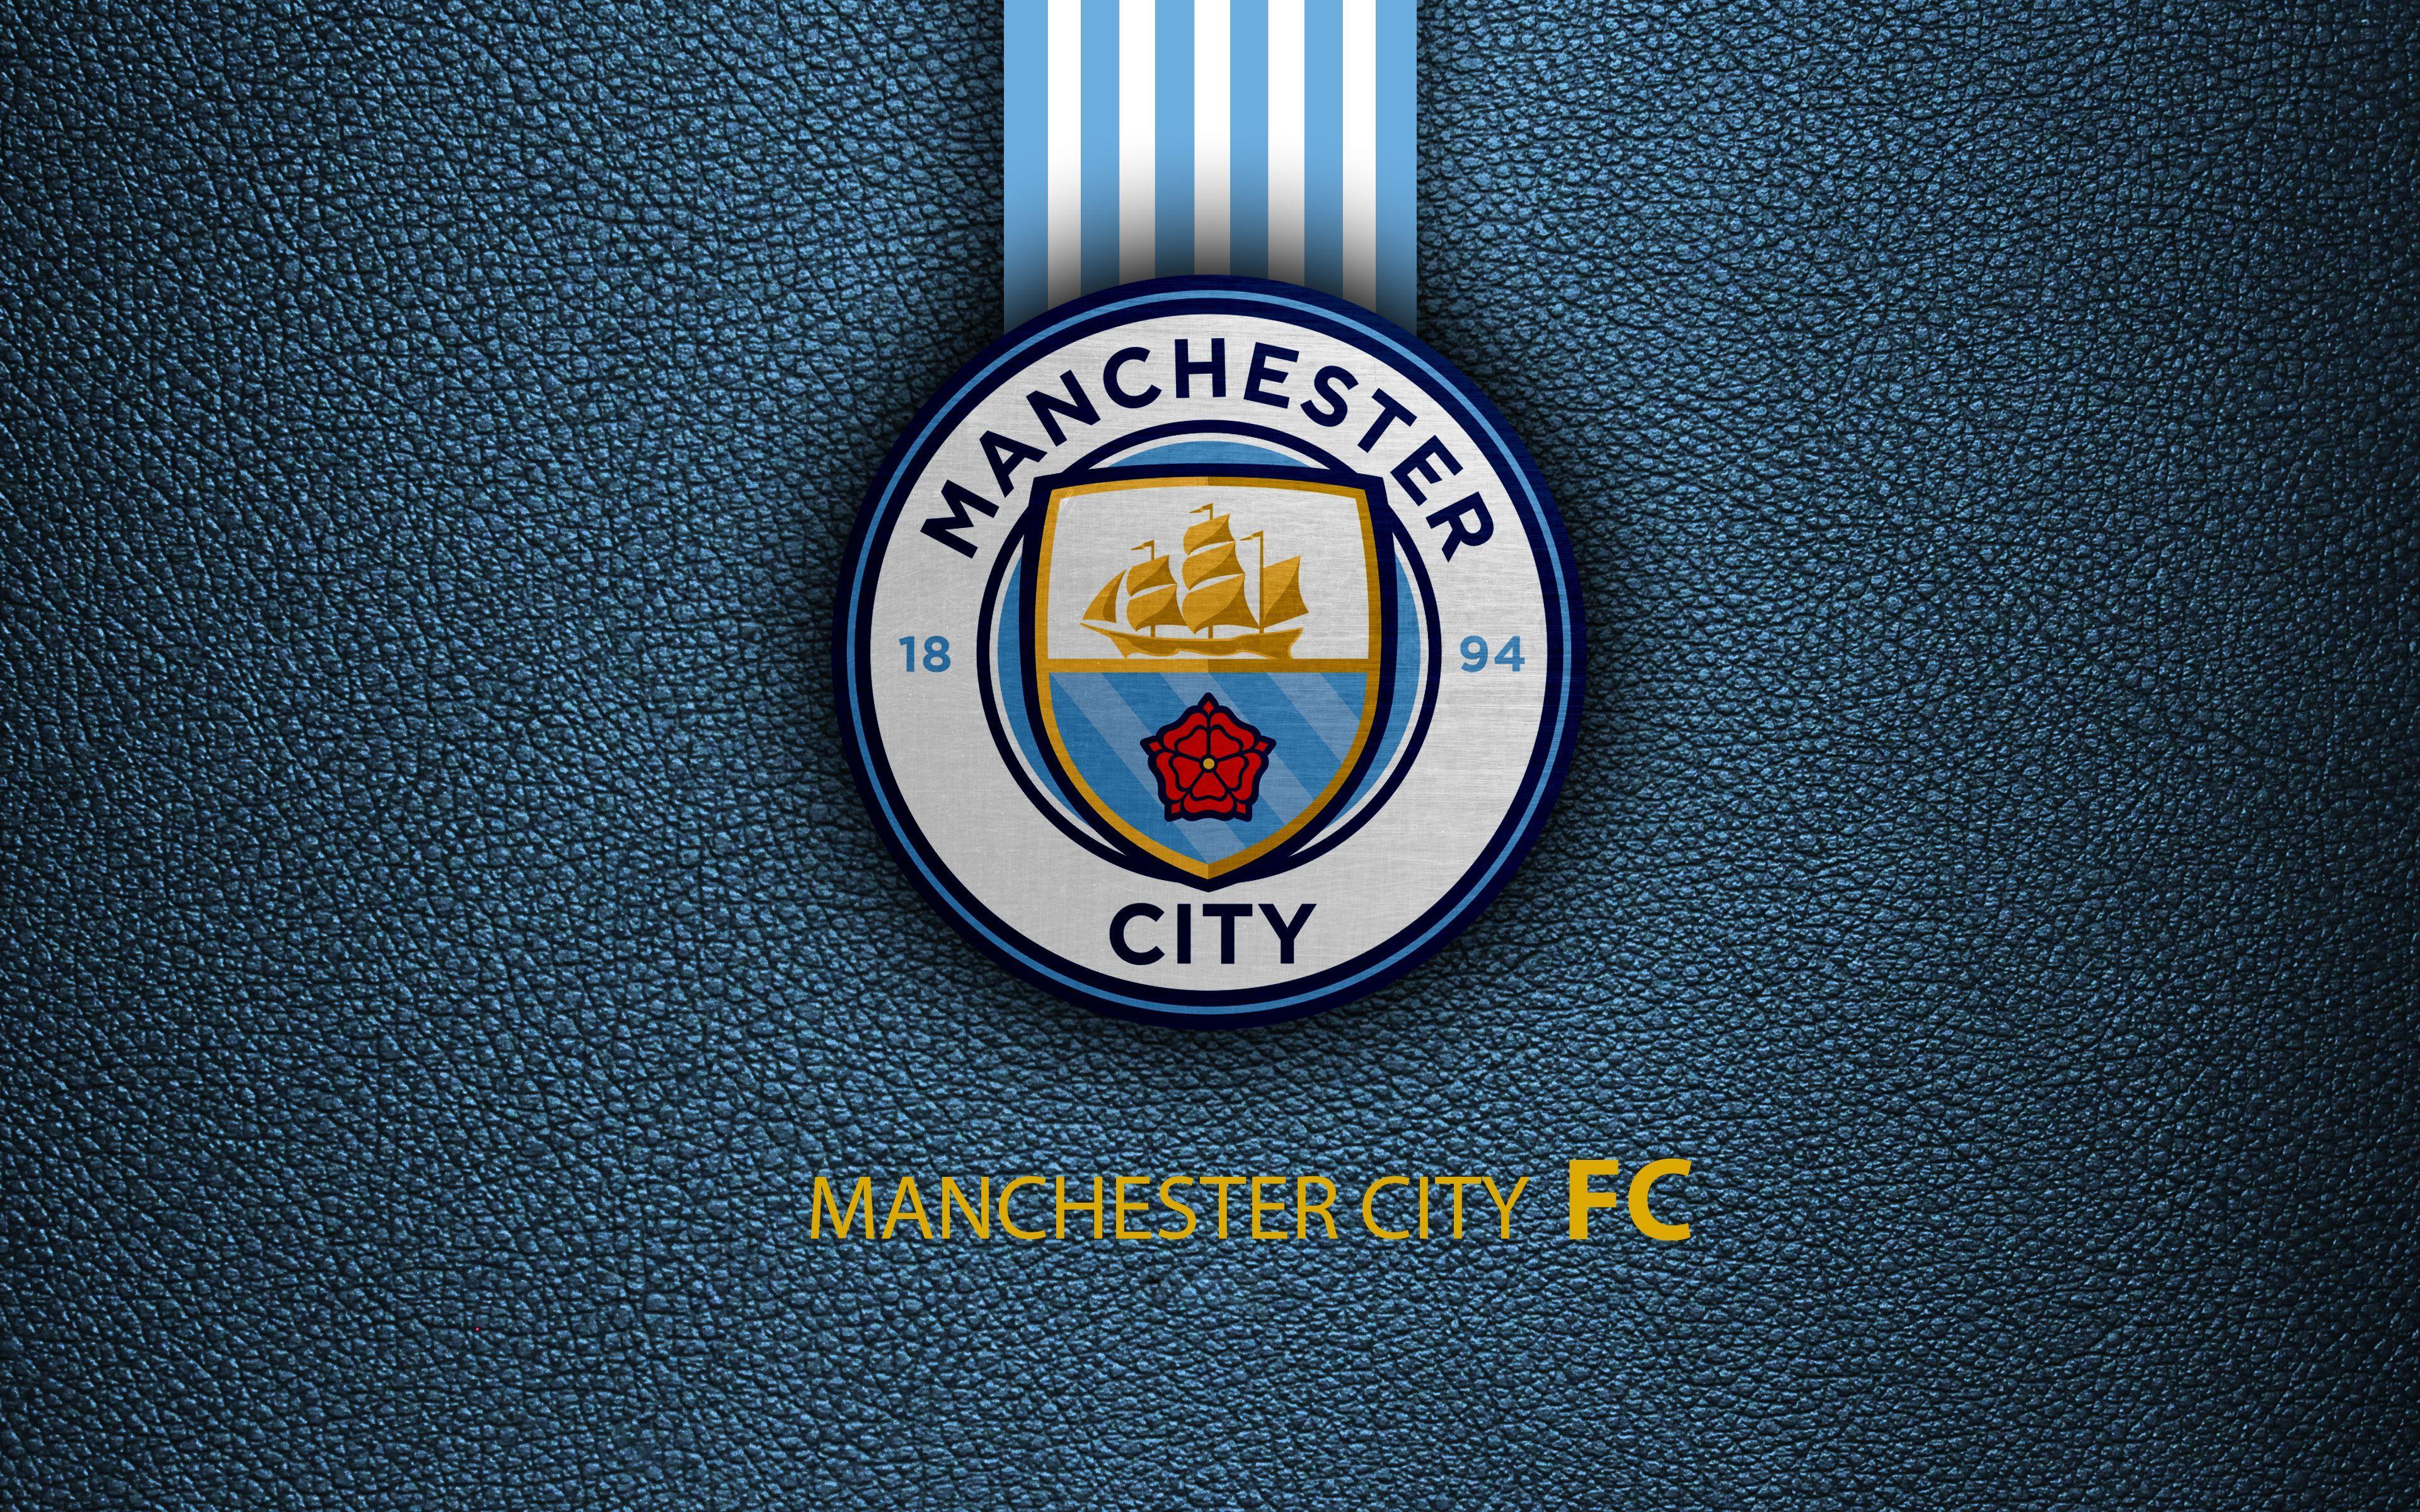 3840x2400 Manchester City Logo 4k Ultra HD Wallpaper | Background ...